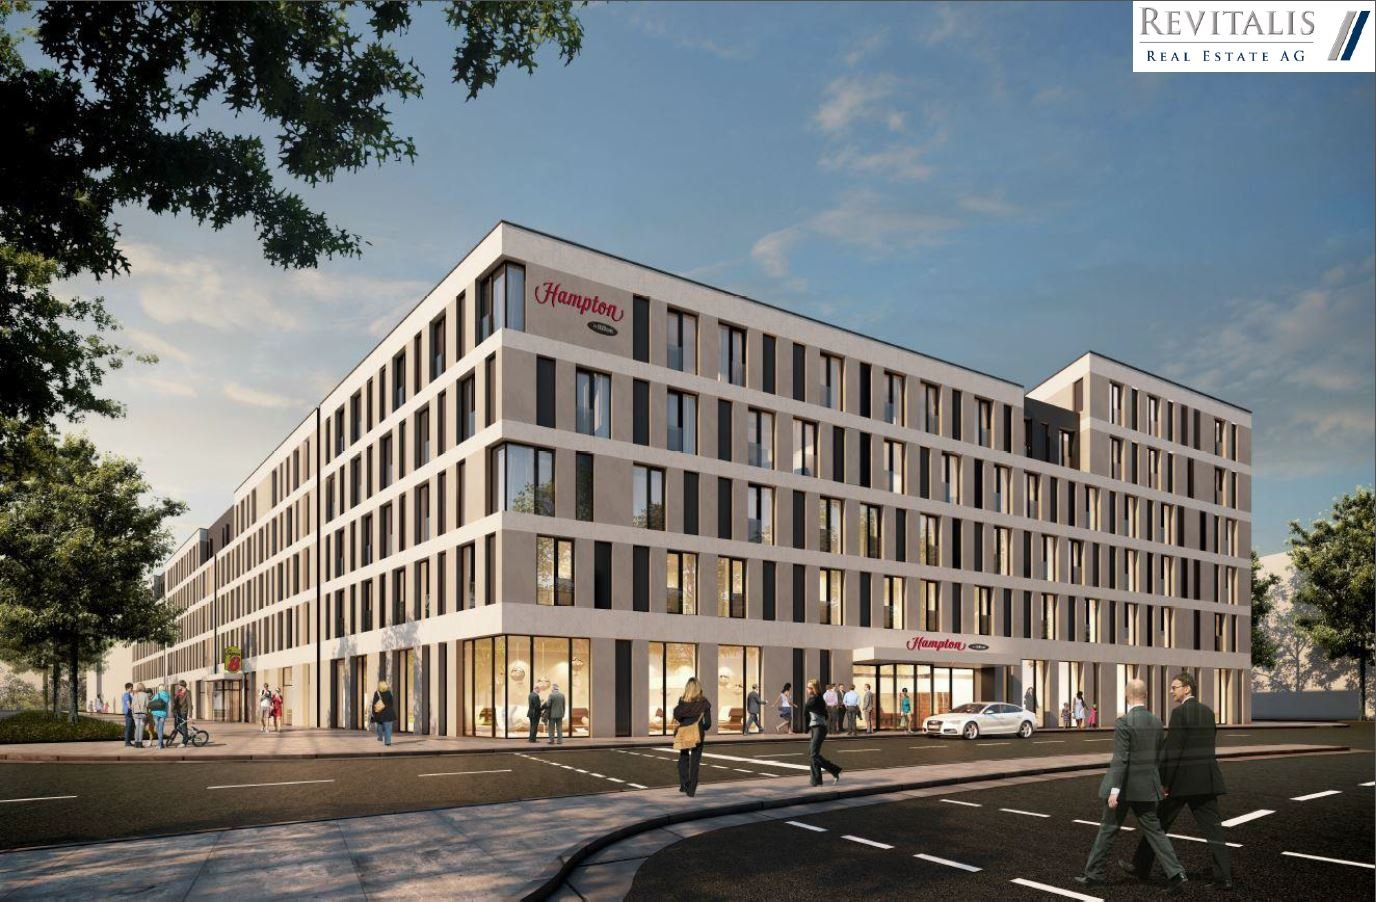 Hampton by Hilton in Freiburg